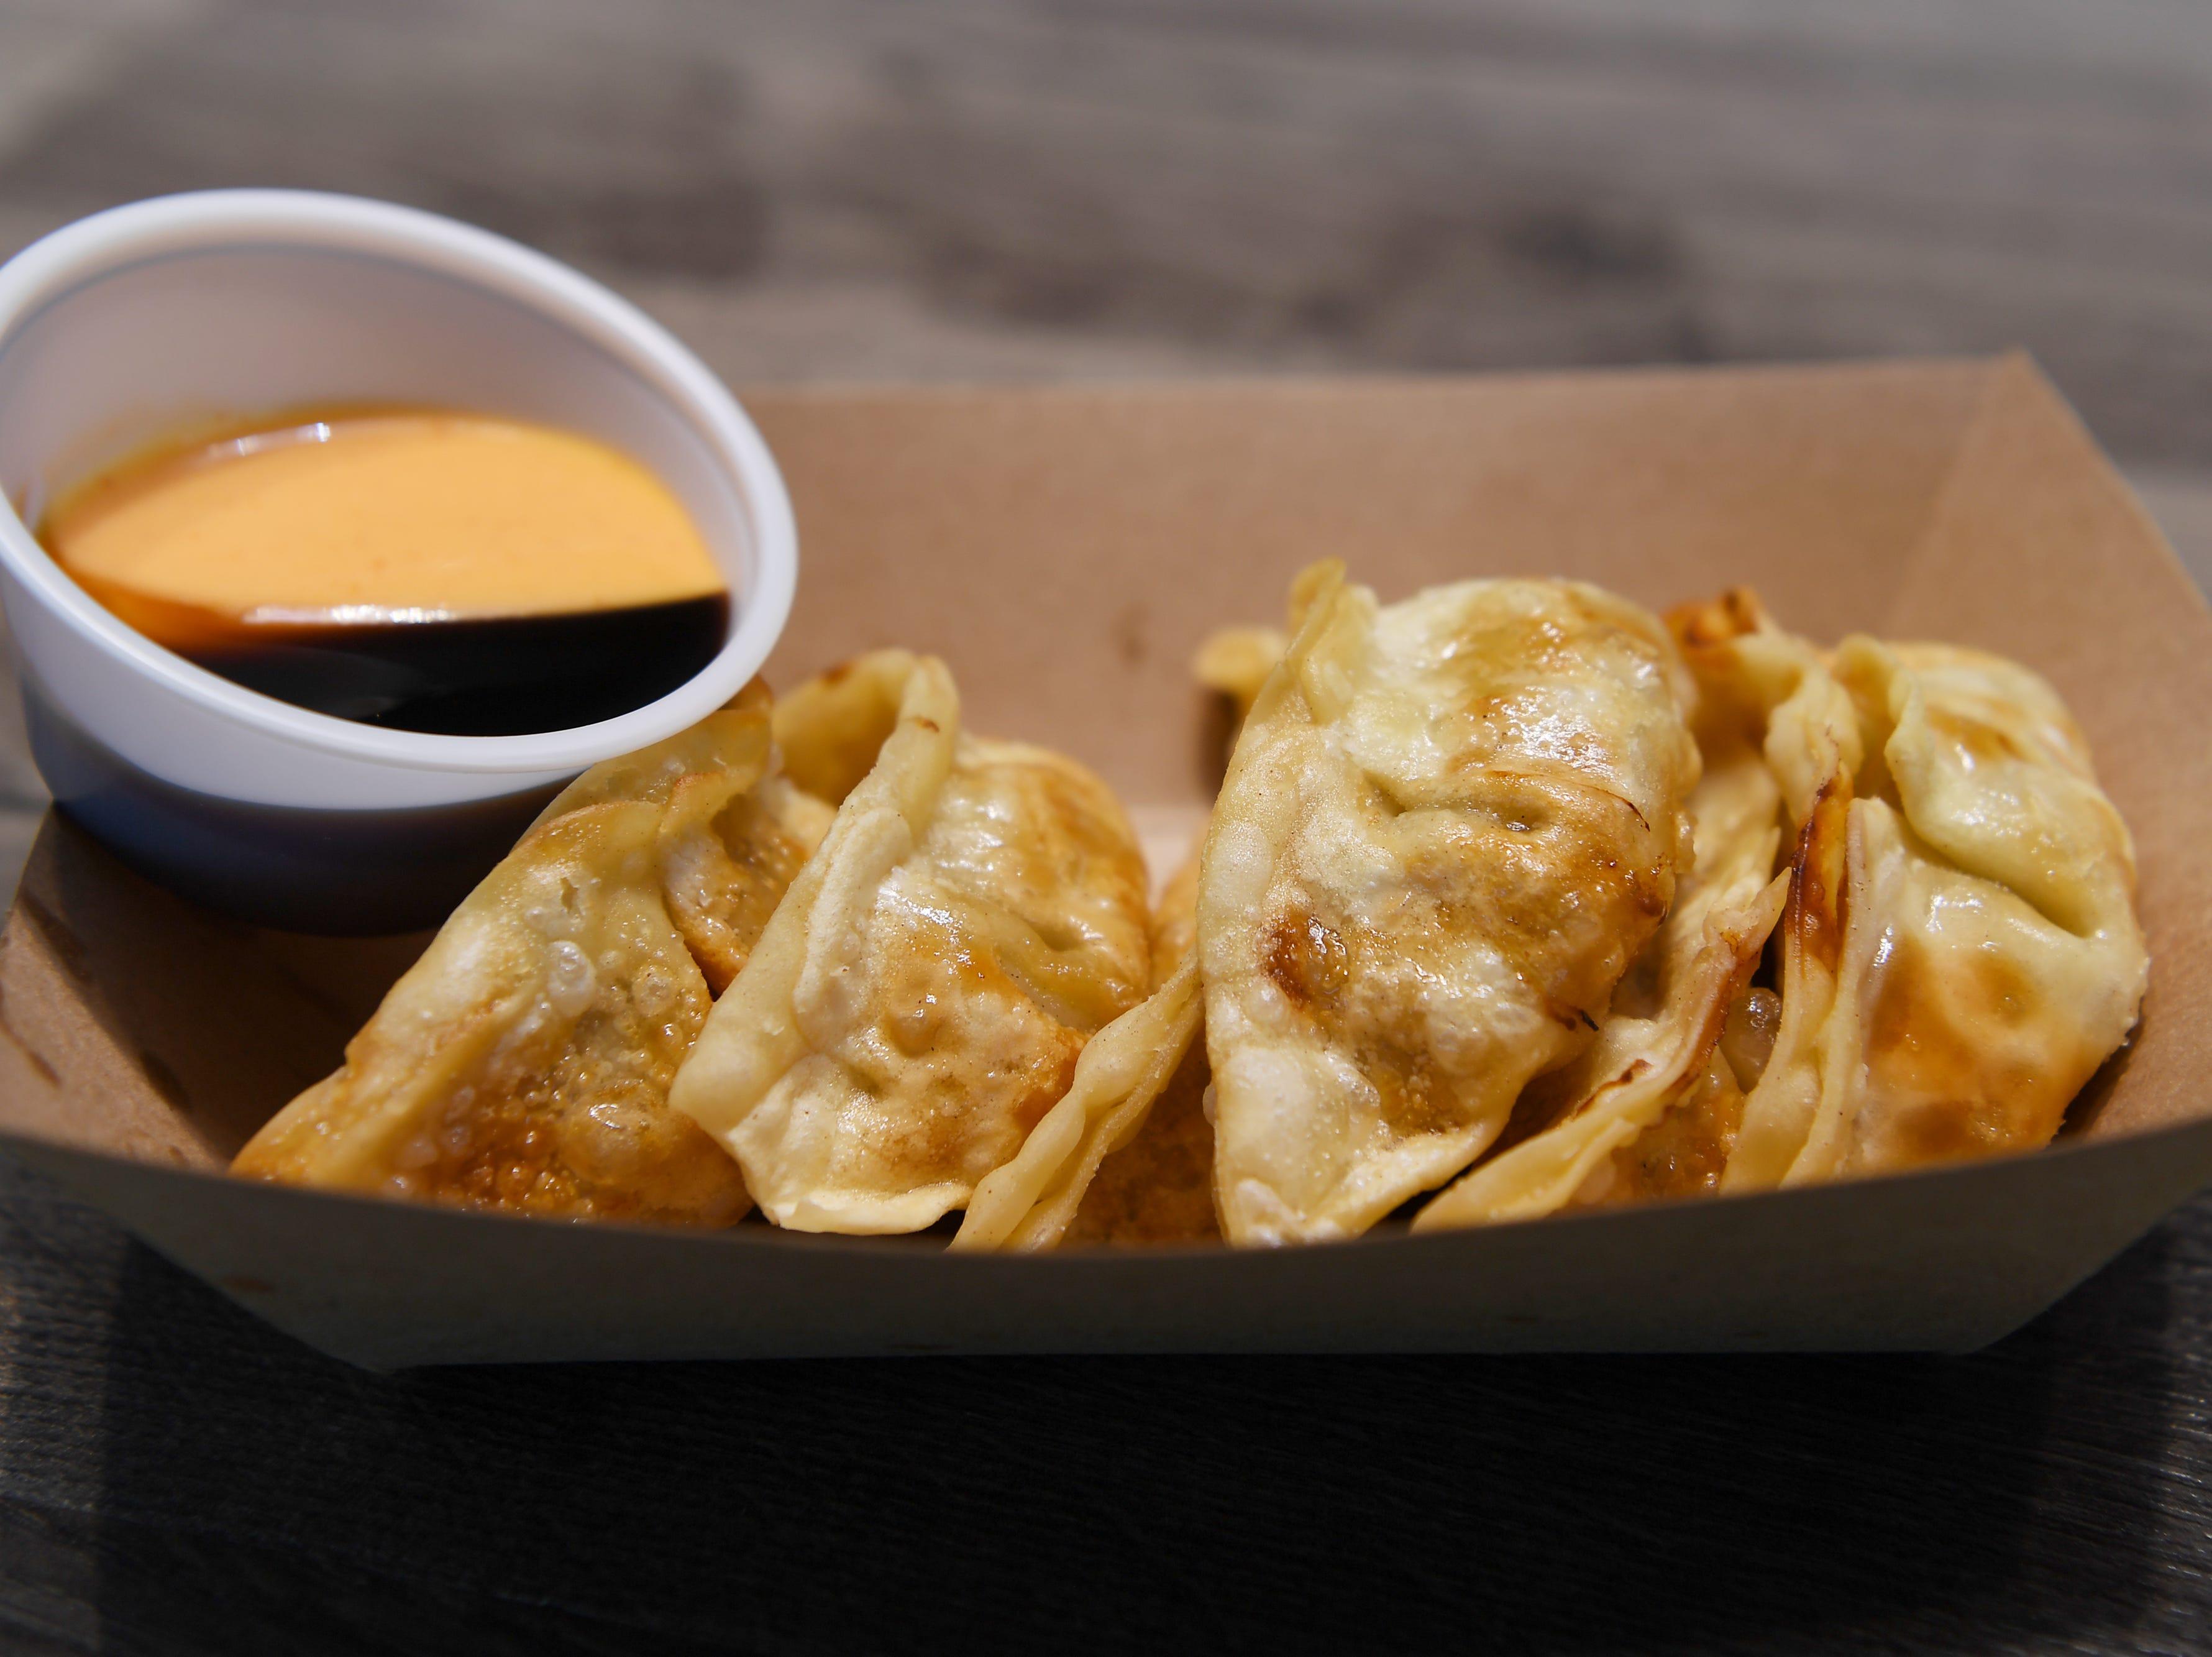 Yum Sushi and Poke's fried pork gyoza are pork dumplings deep fried & served with sriracha aioli.